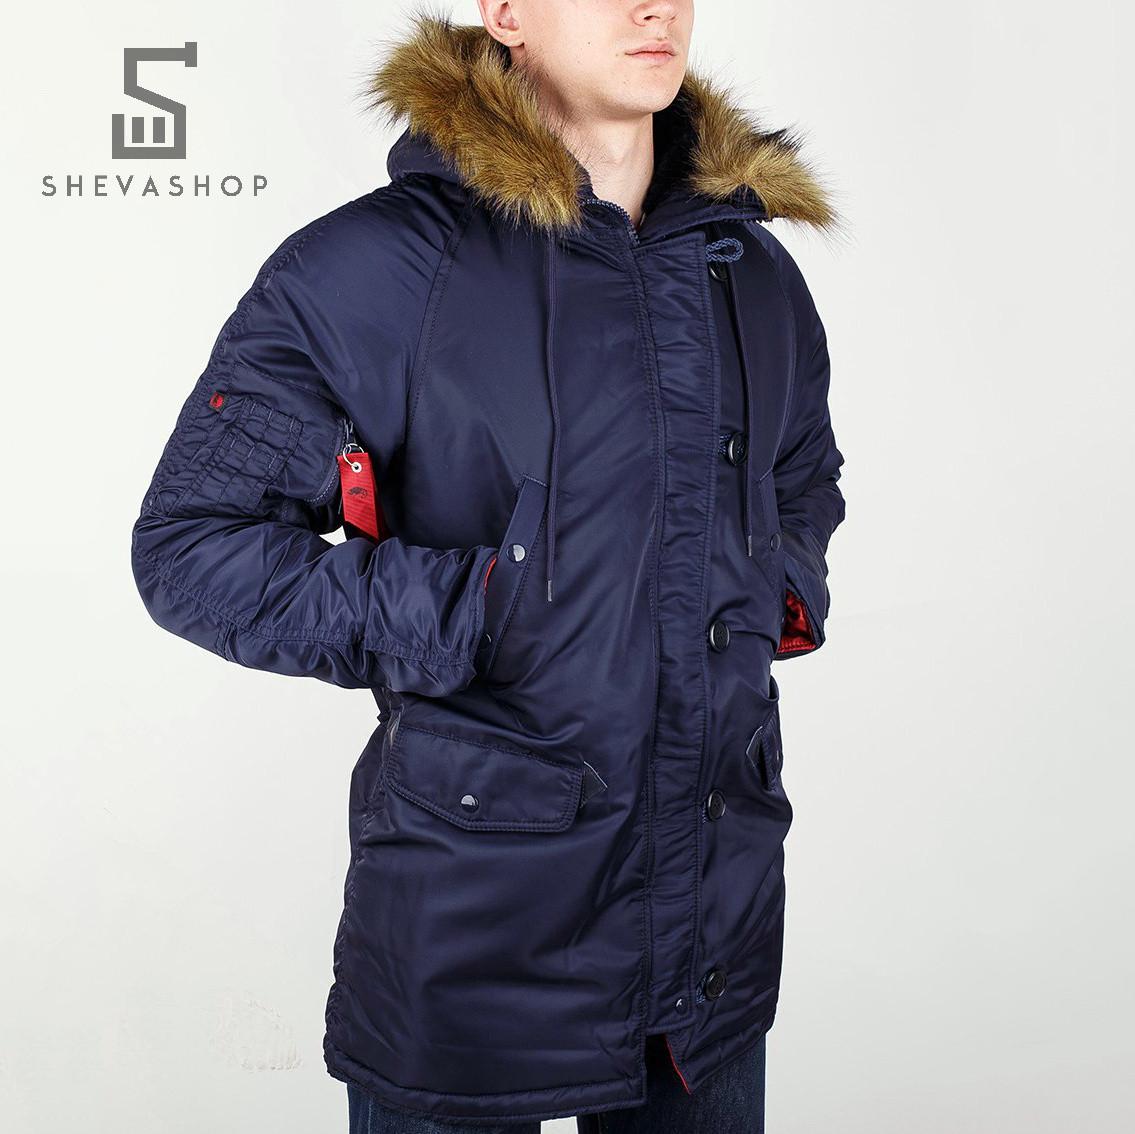 Зимняя мужская куртка Chameleon темно-синяя